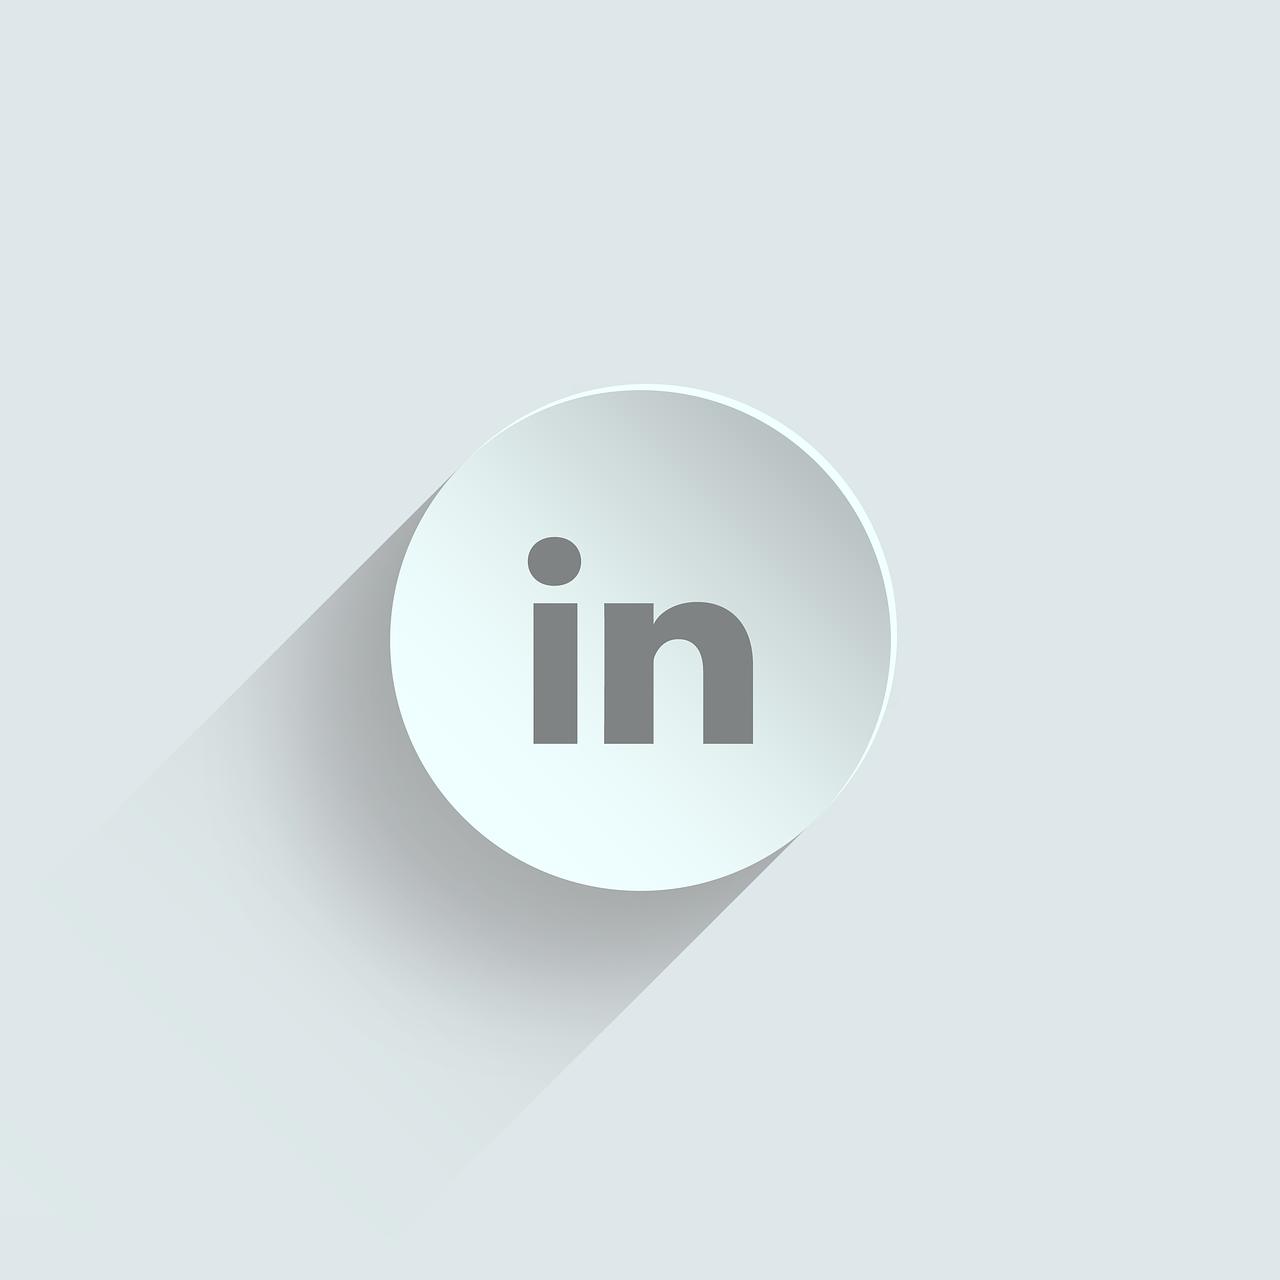 linkedin-2095609_1280.png